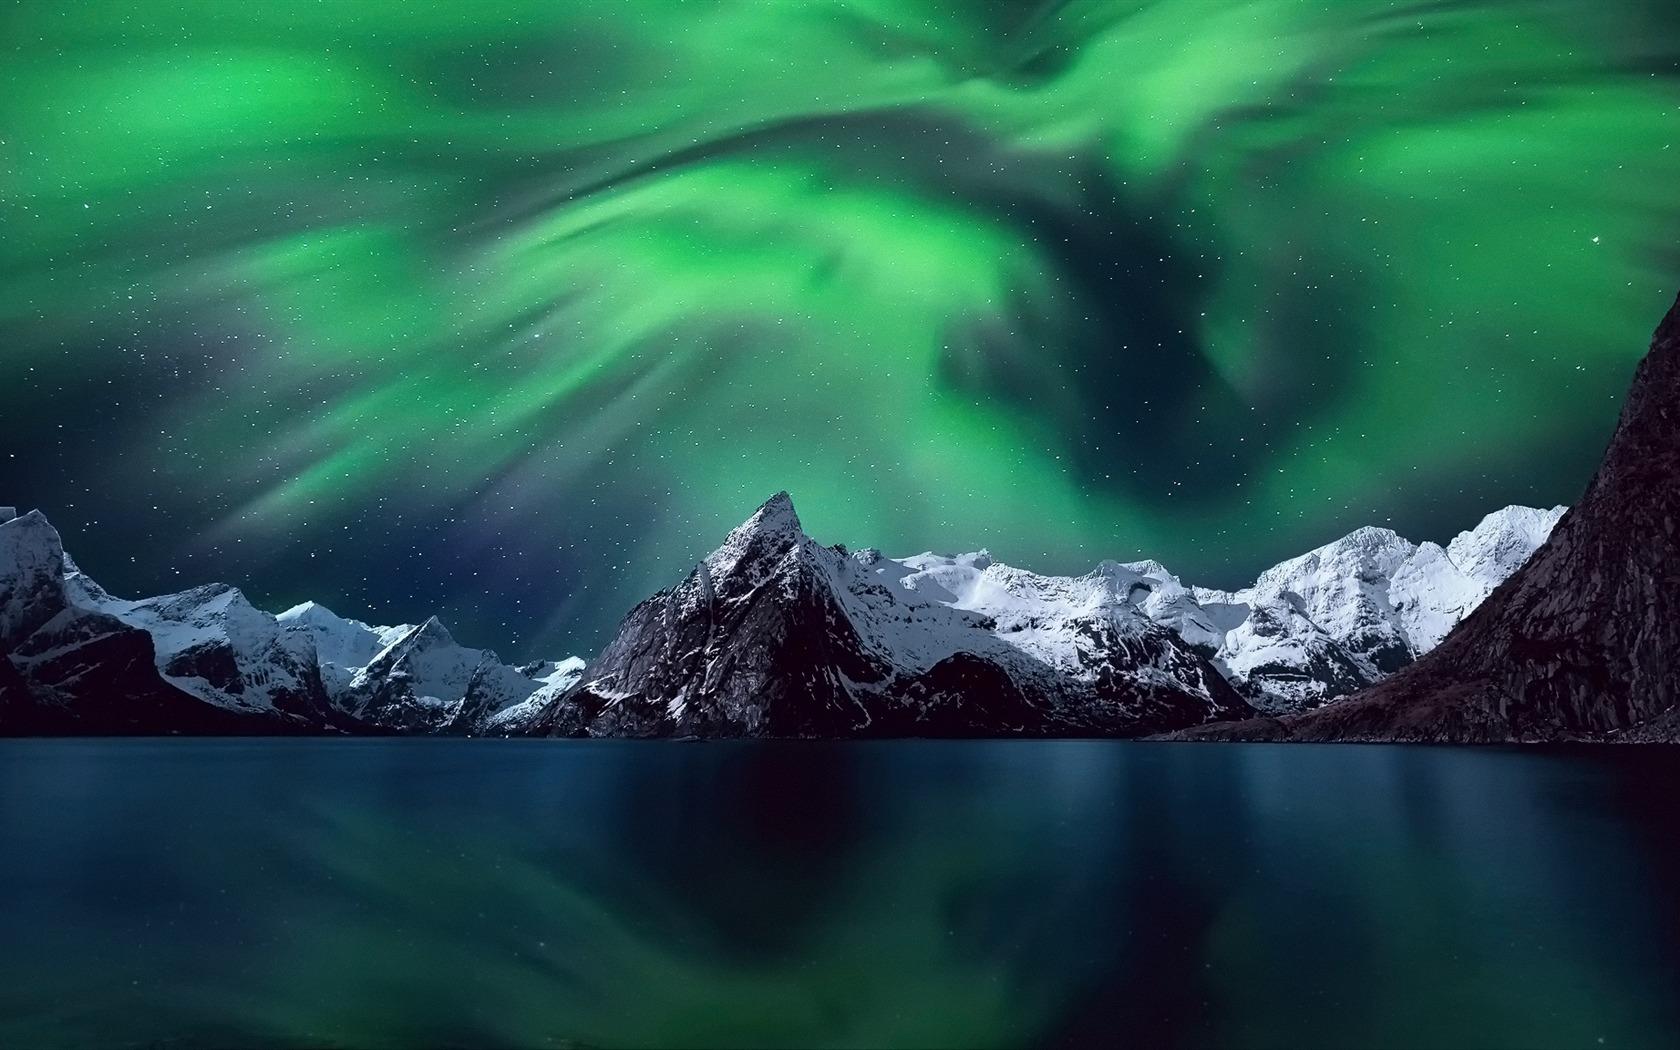 Fondo De Pantalla Paisaje Montañas Nevada: Luces Del Norte Montañas Nieve-Paisaje Perfecto Fondo De